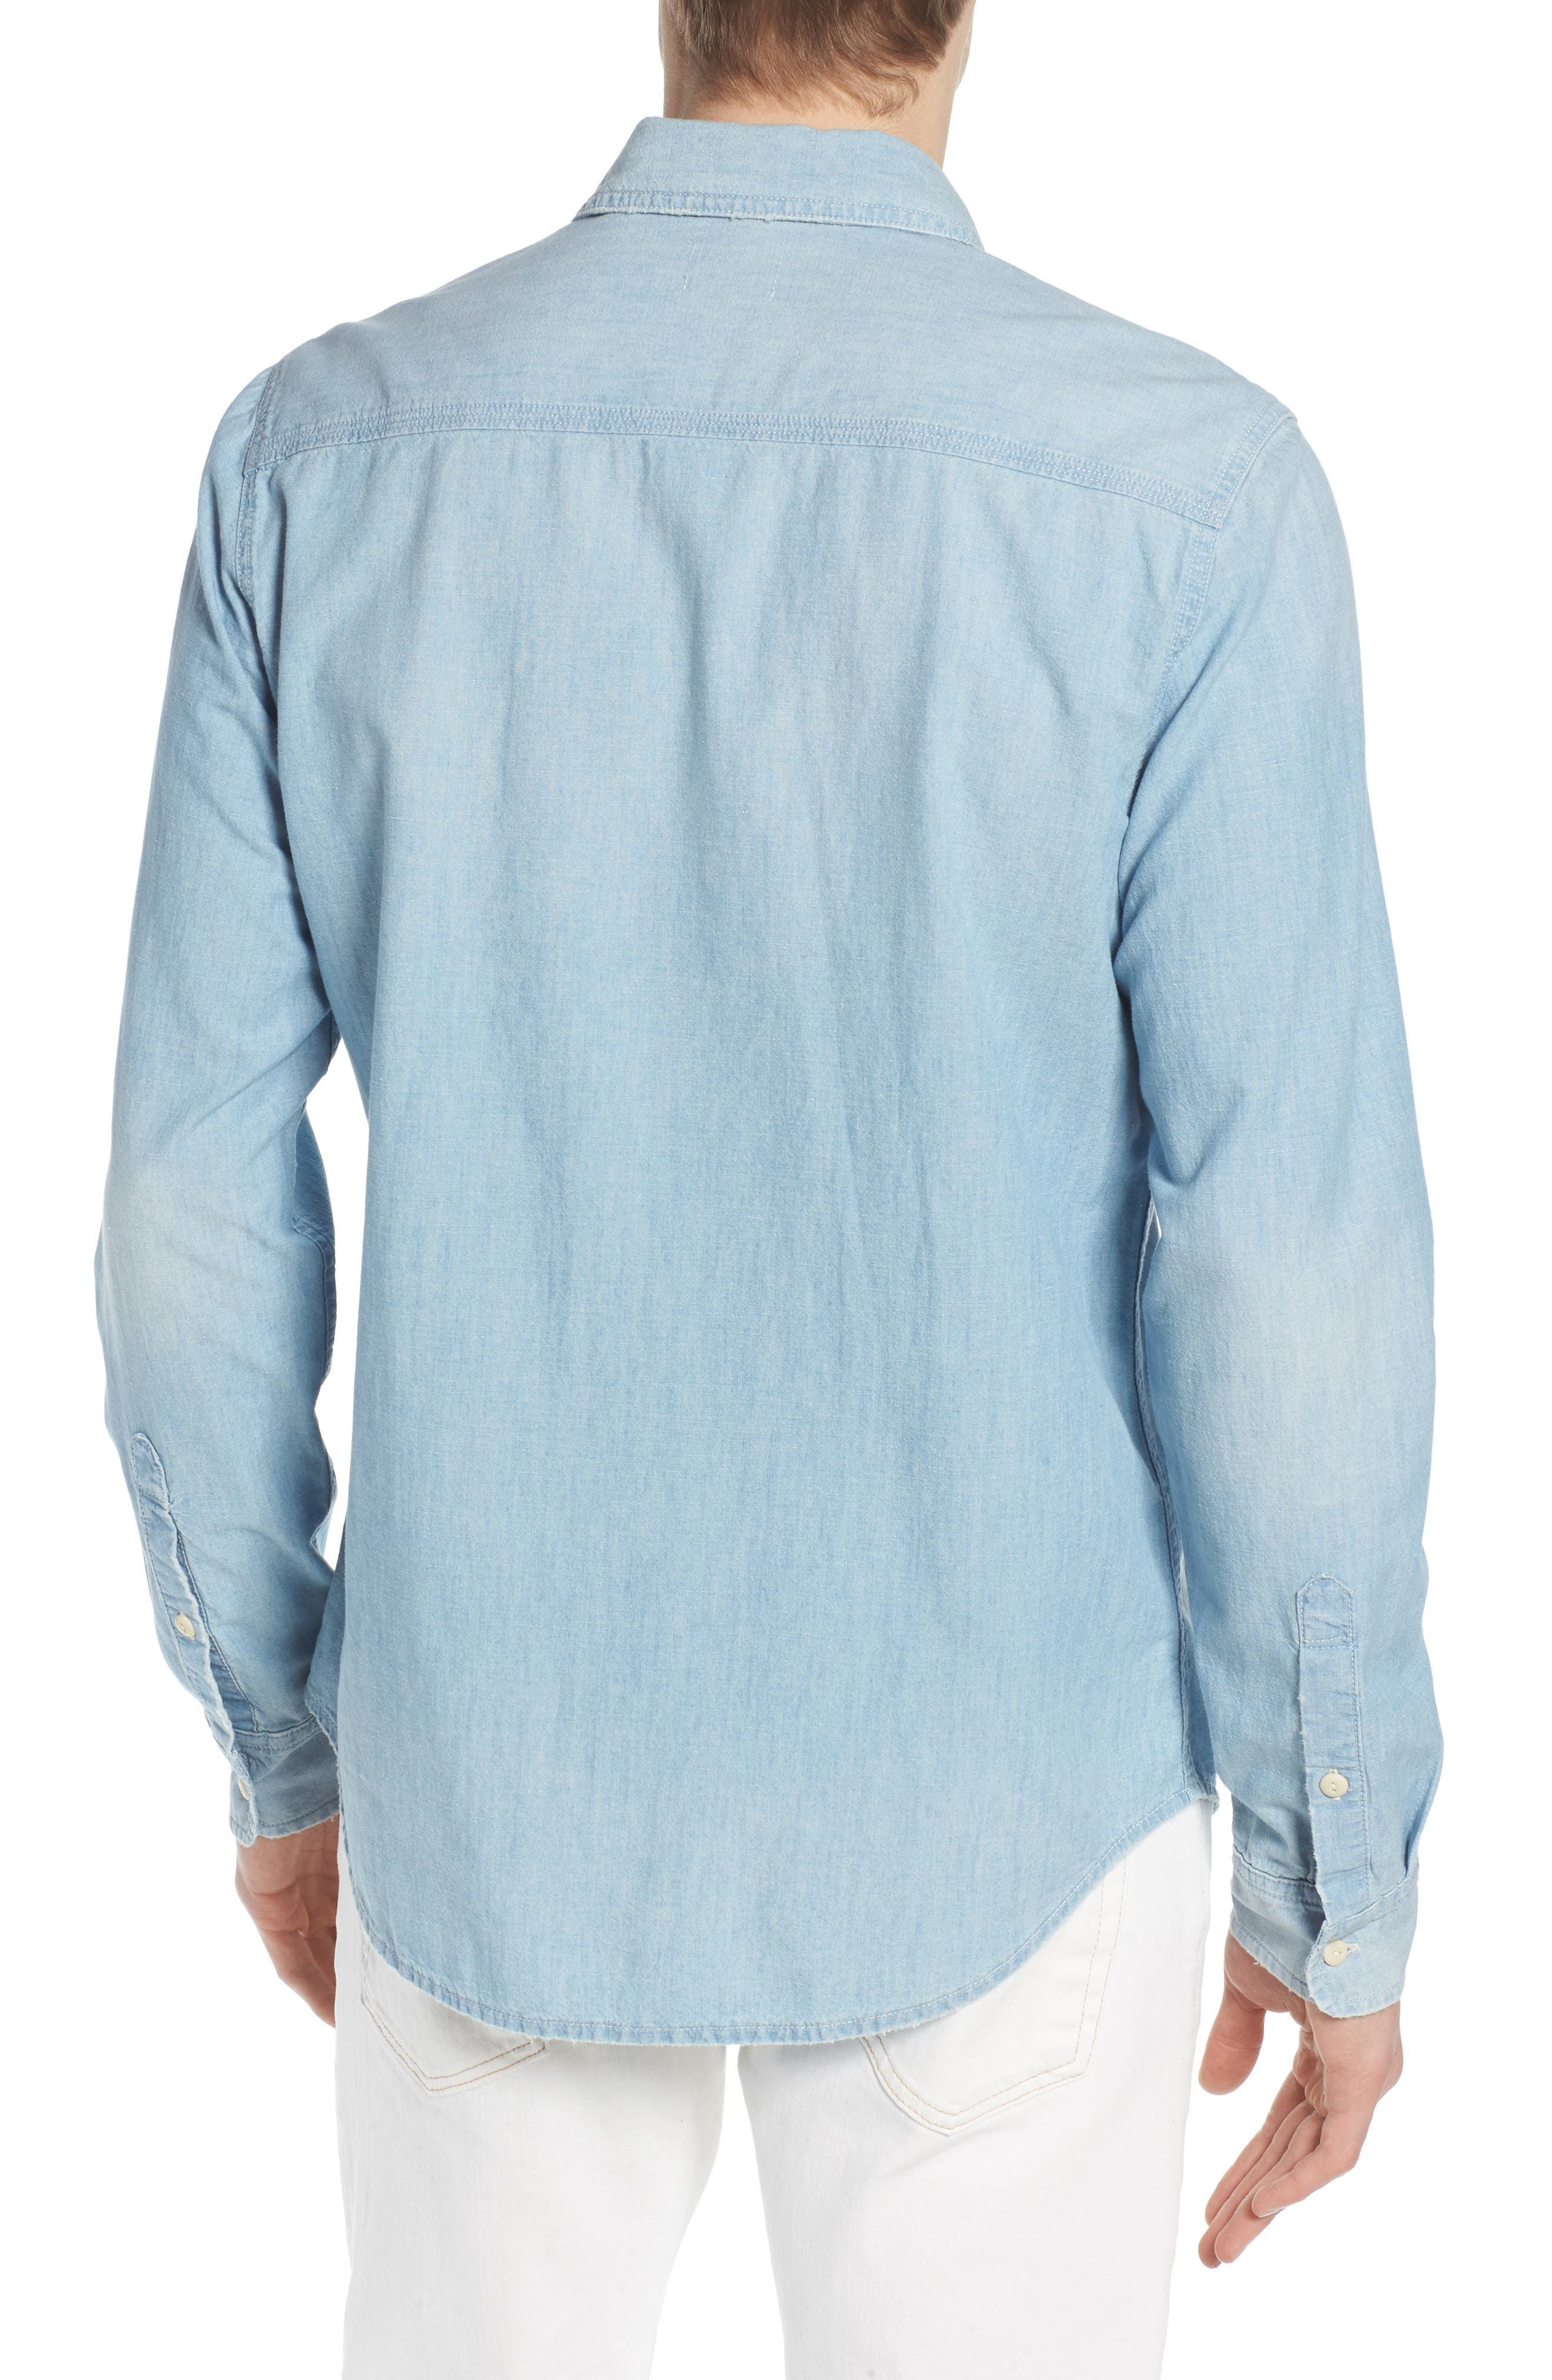 Benning Regular Fit Sport Shirt,                             Alternate thumbnail 2, color,                             499